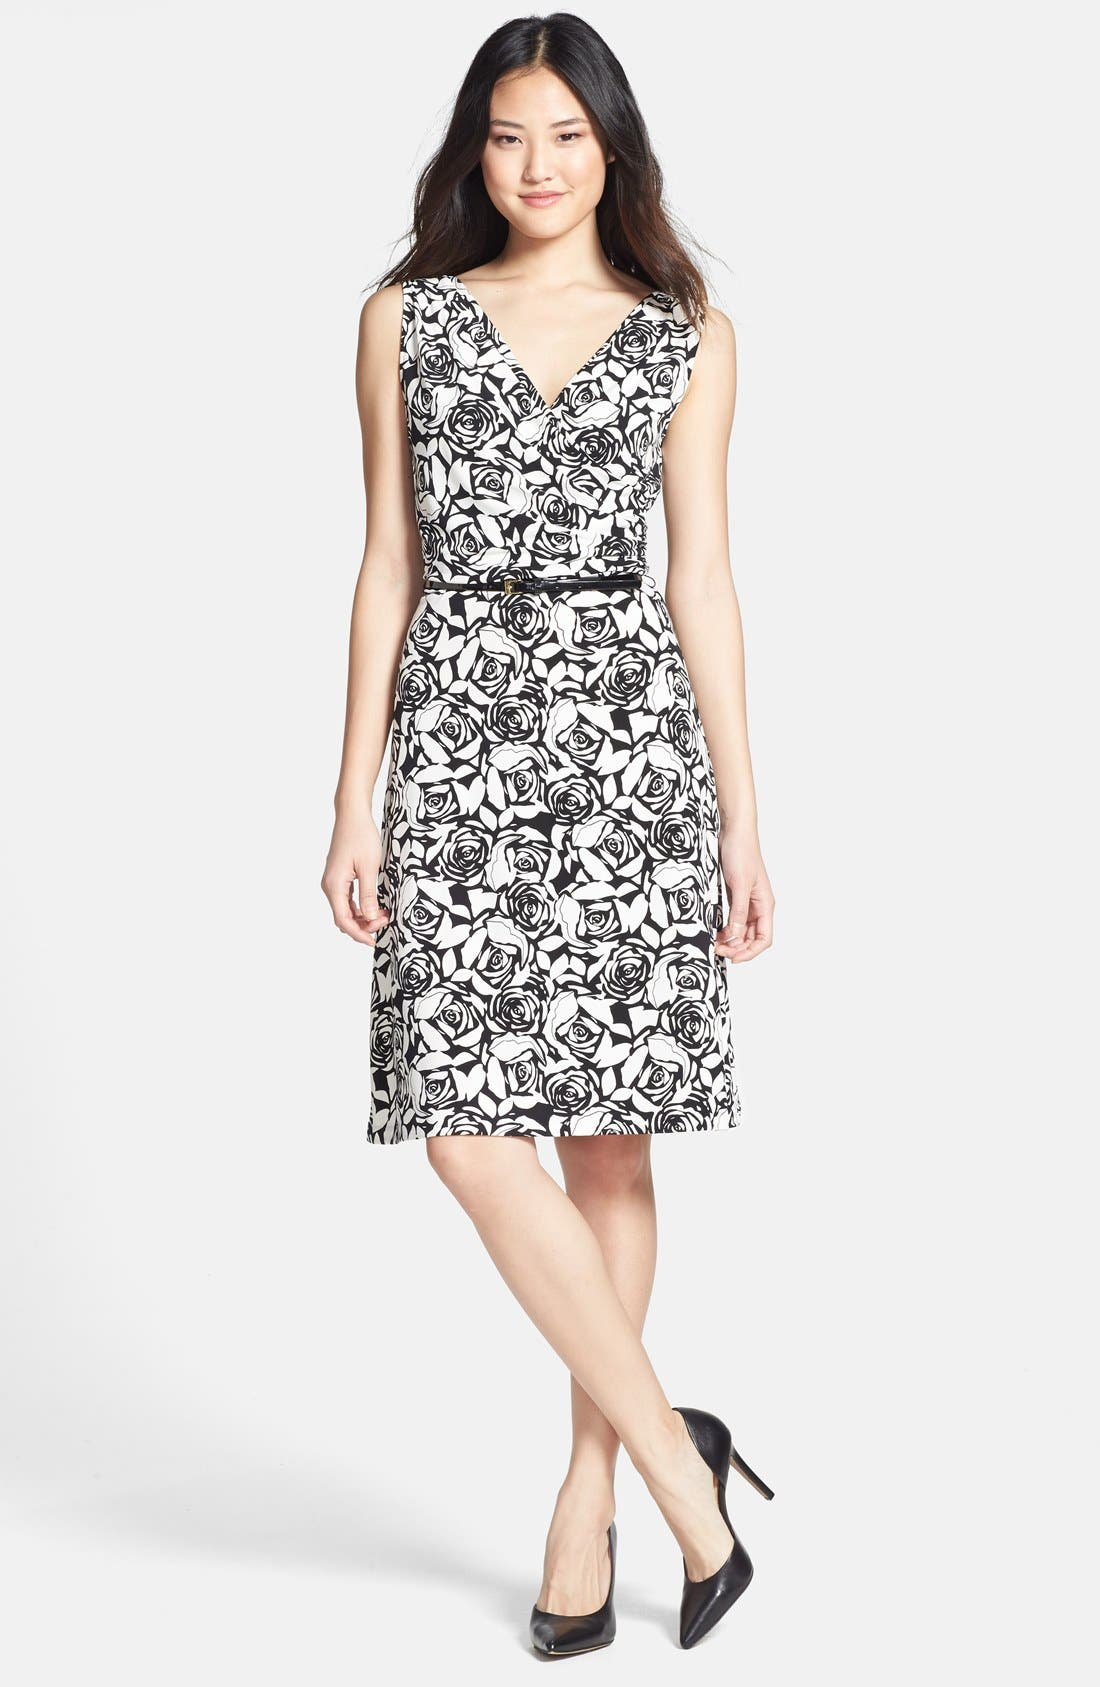 Main Image - Anne Klein Belted Rose Print Dress